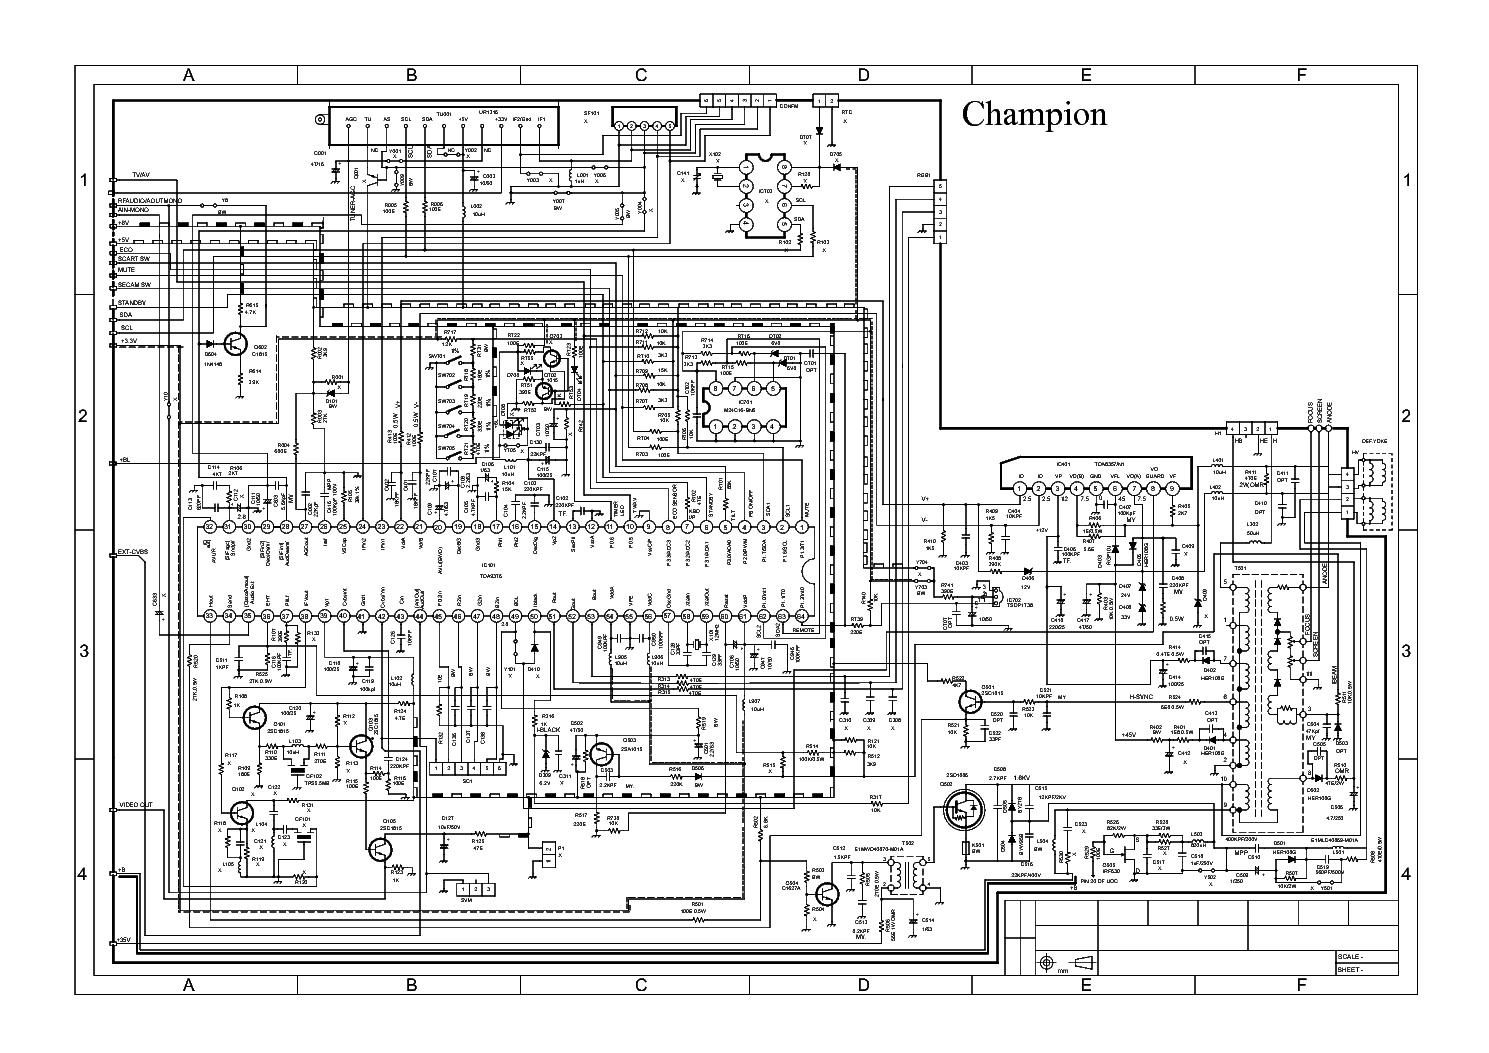 Tda6107jf datasheet